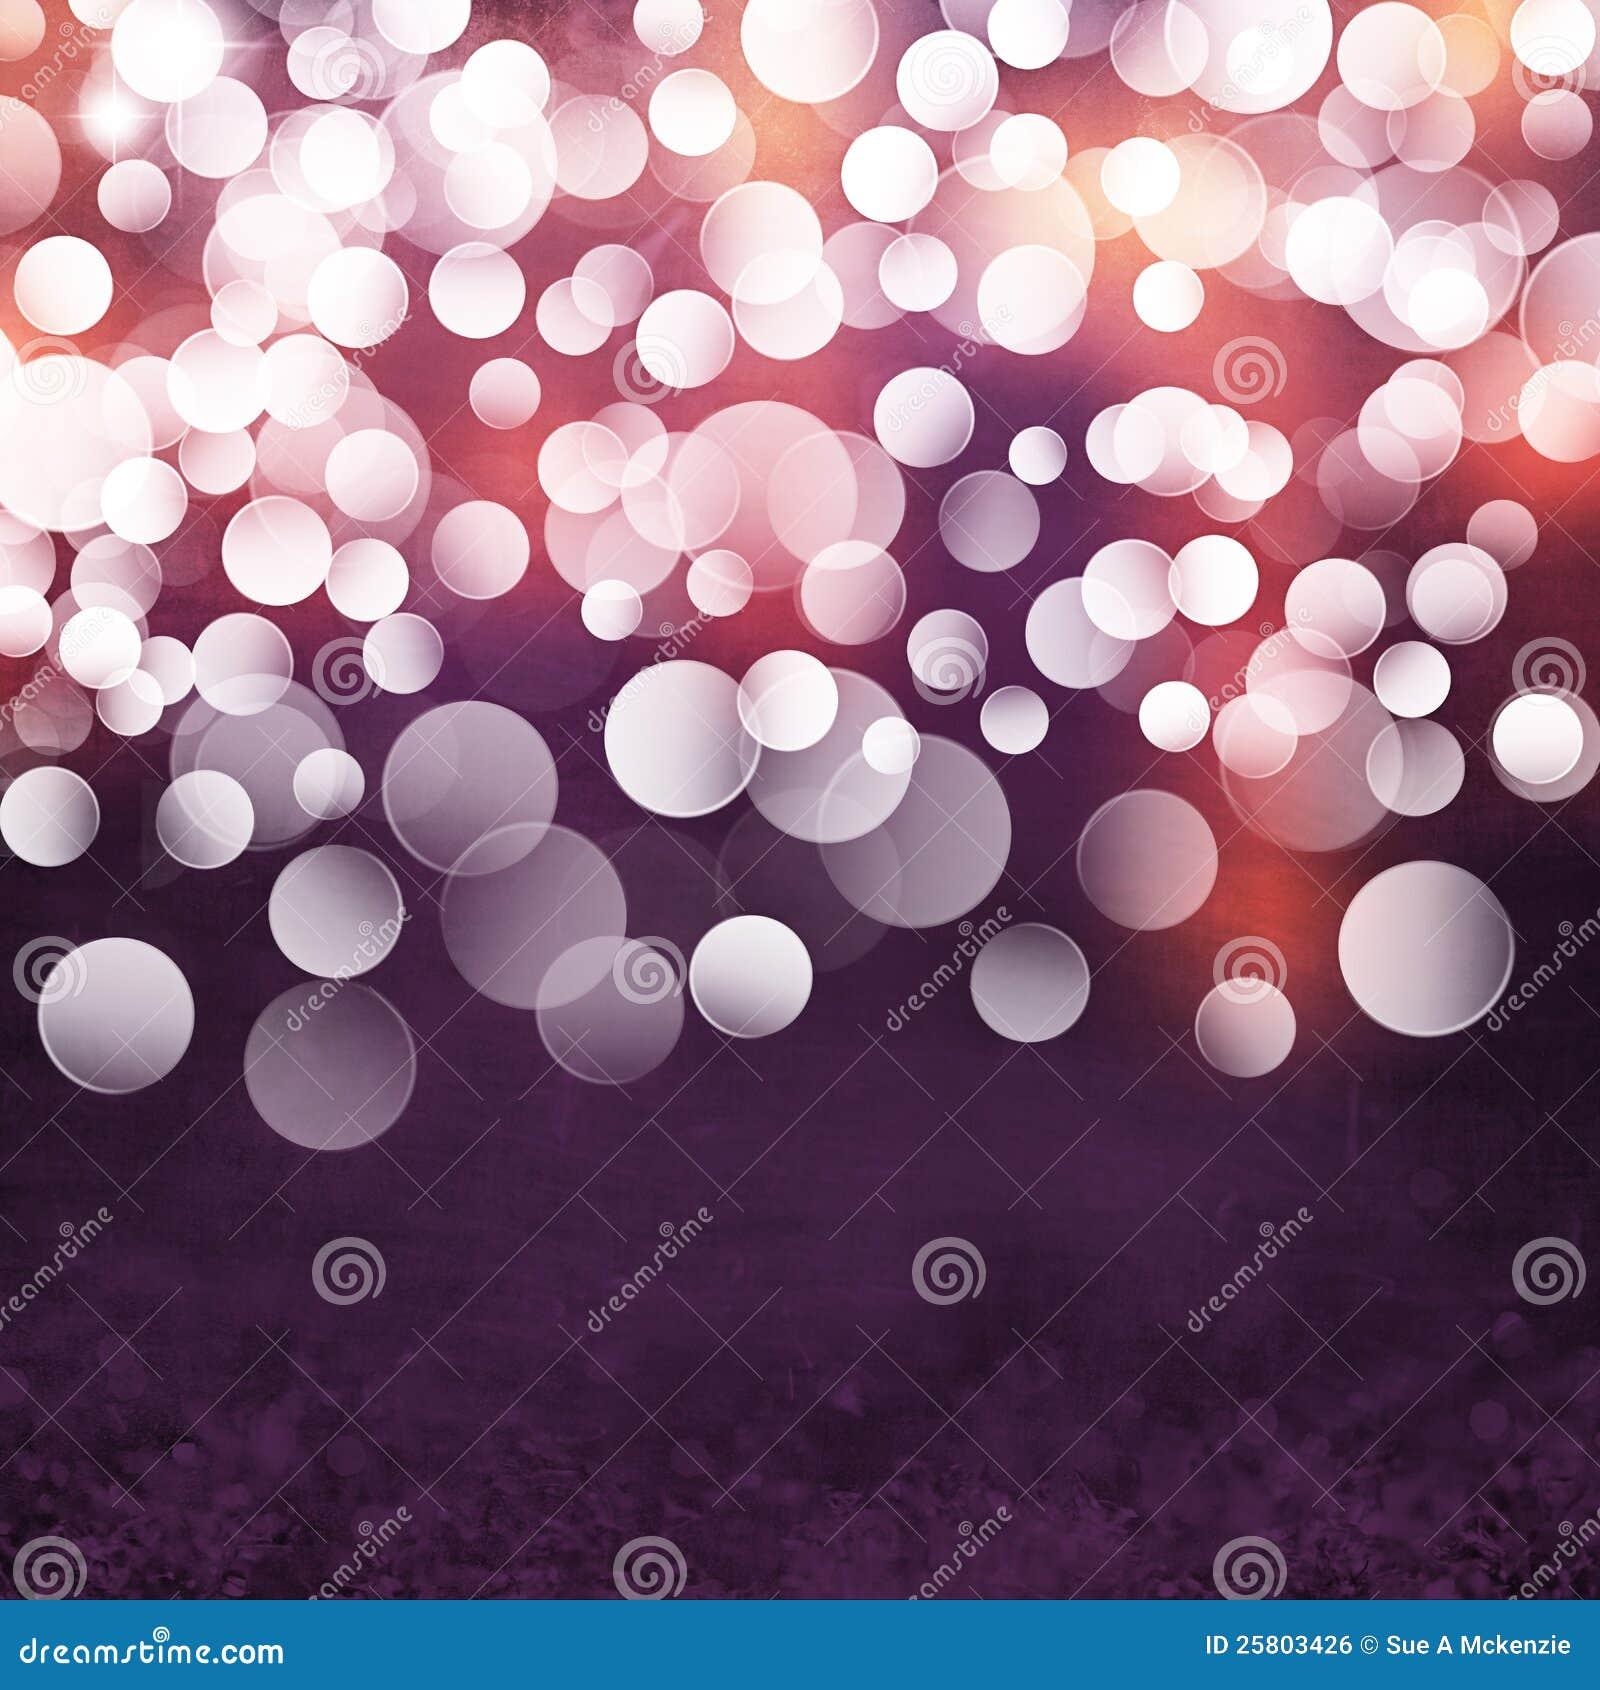 Elegant Textured Grunge Purple Gold Pink Christmas Light Bokeh Background